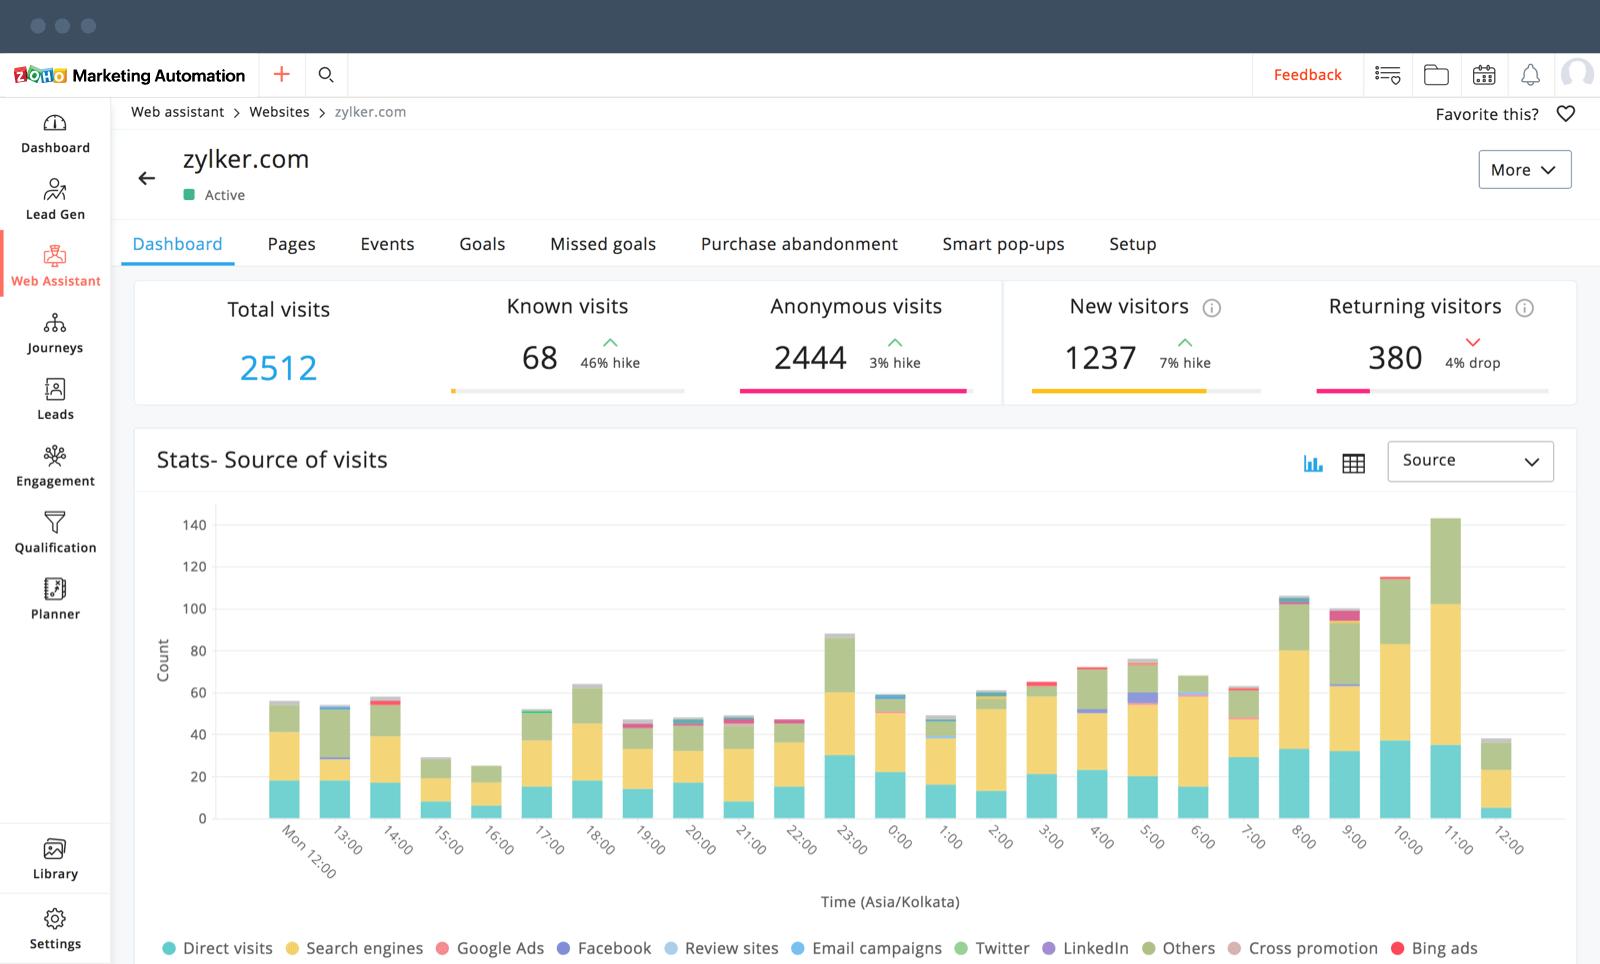 Zoho Marketing Automation Software - 2